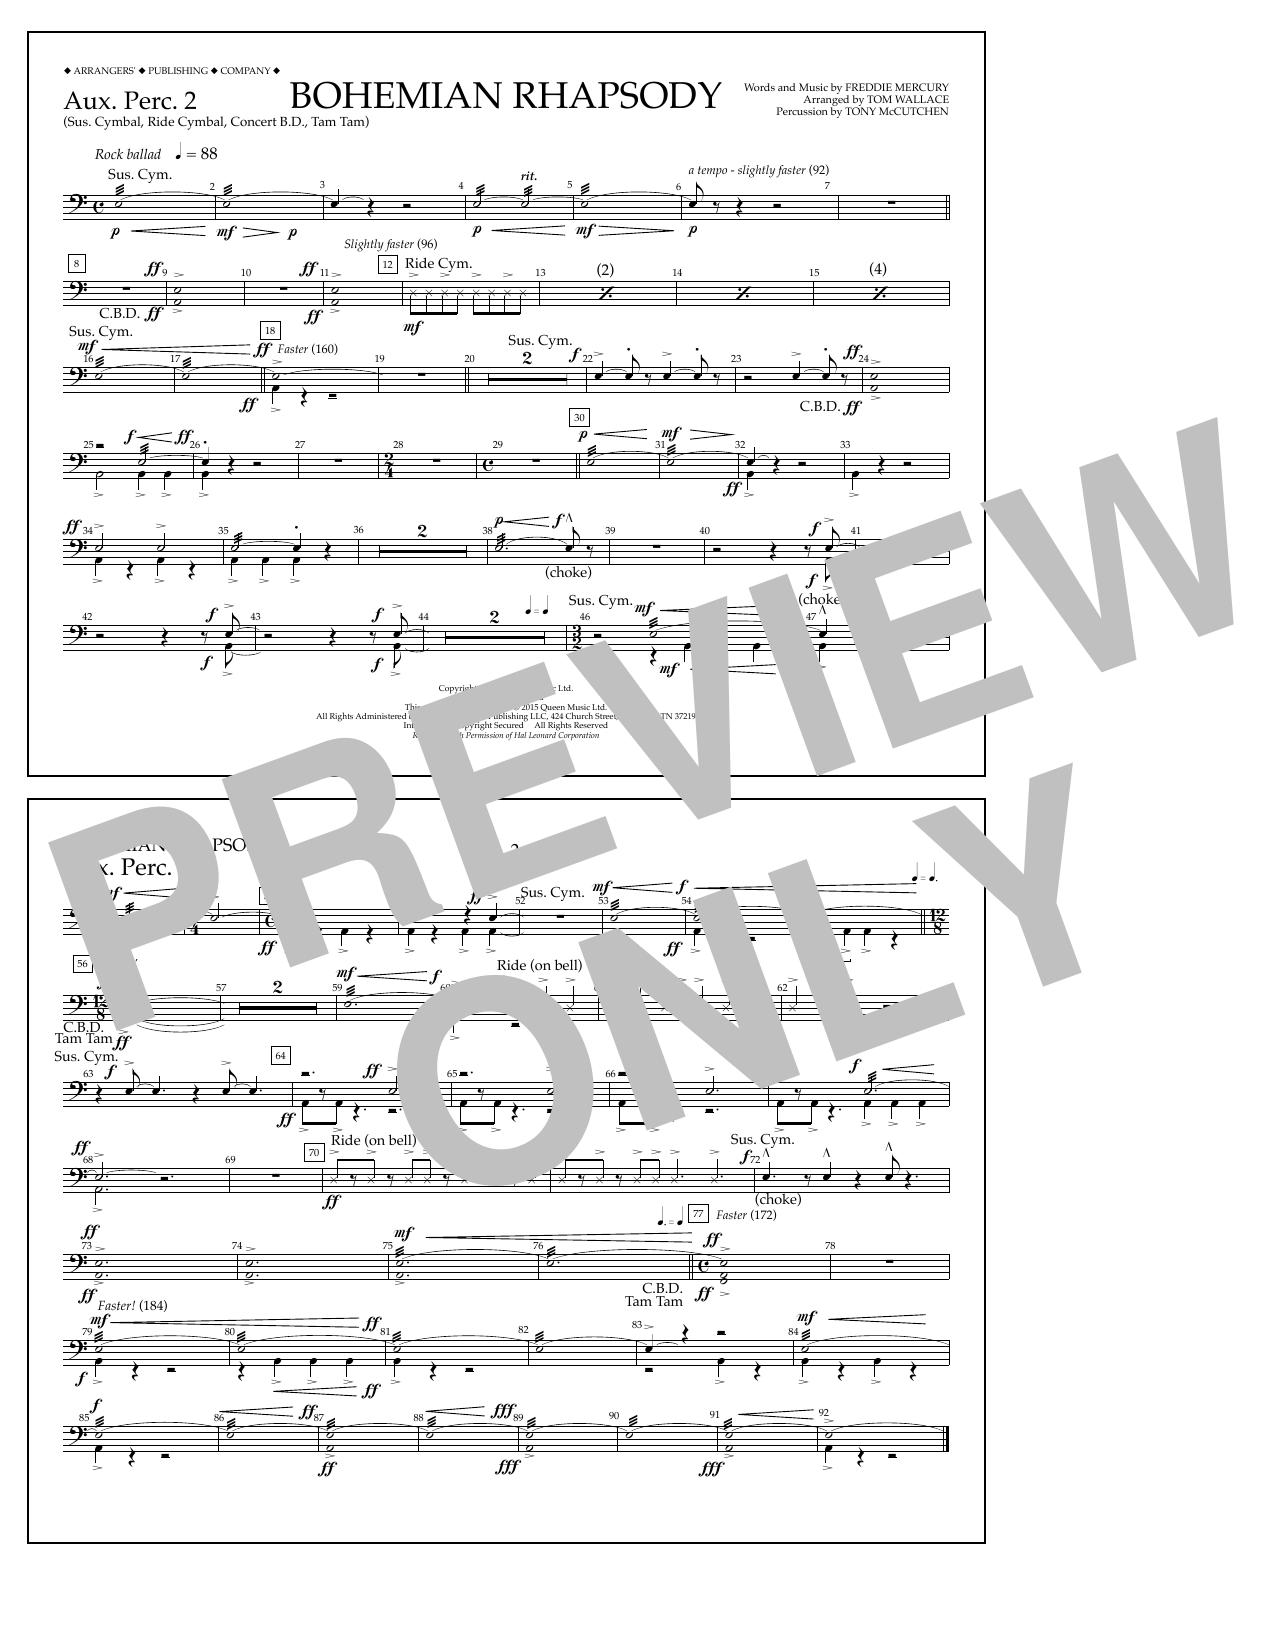 Bohemian Rhapsody - Aux. Perc. 2 (Marching Band)